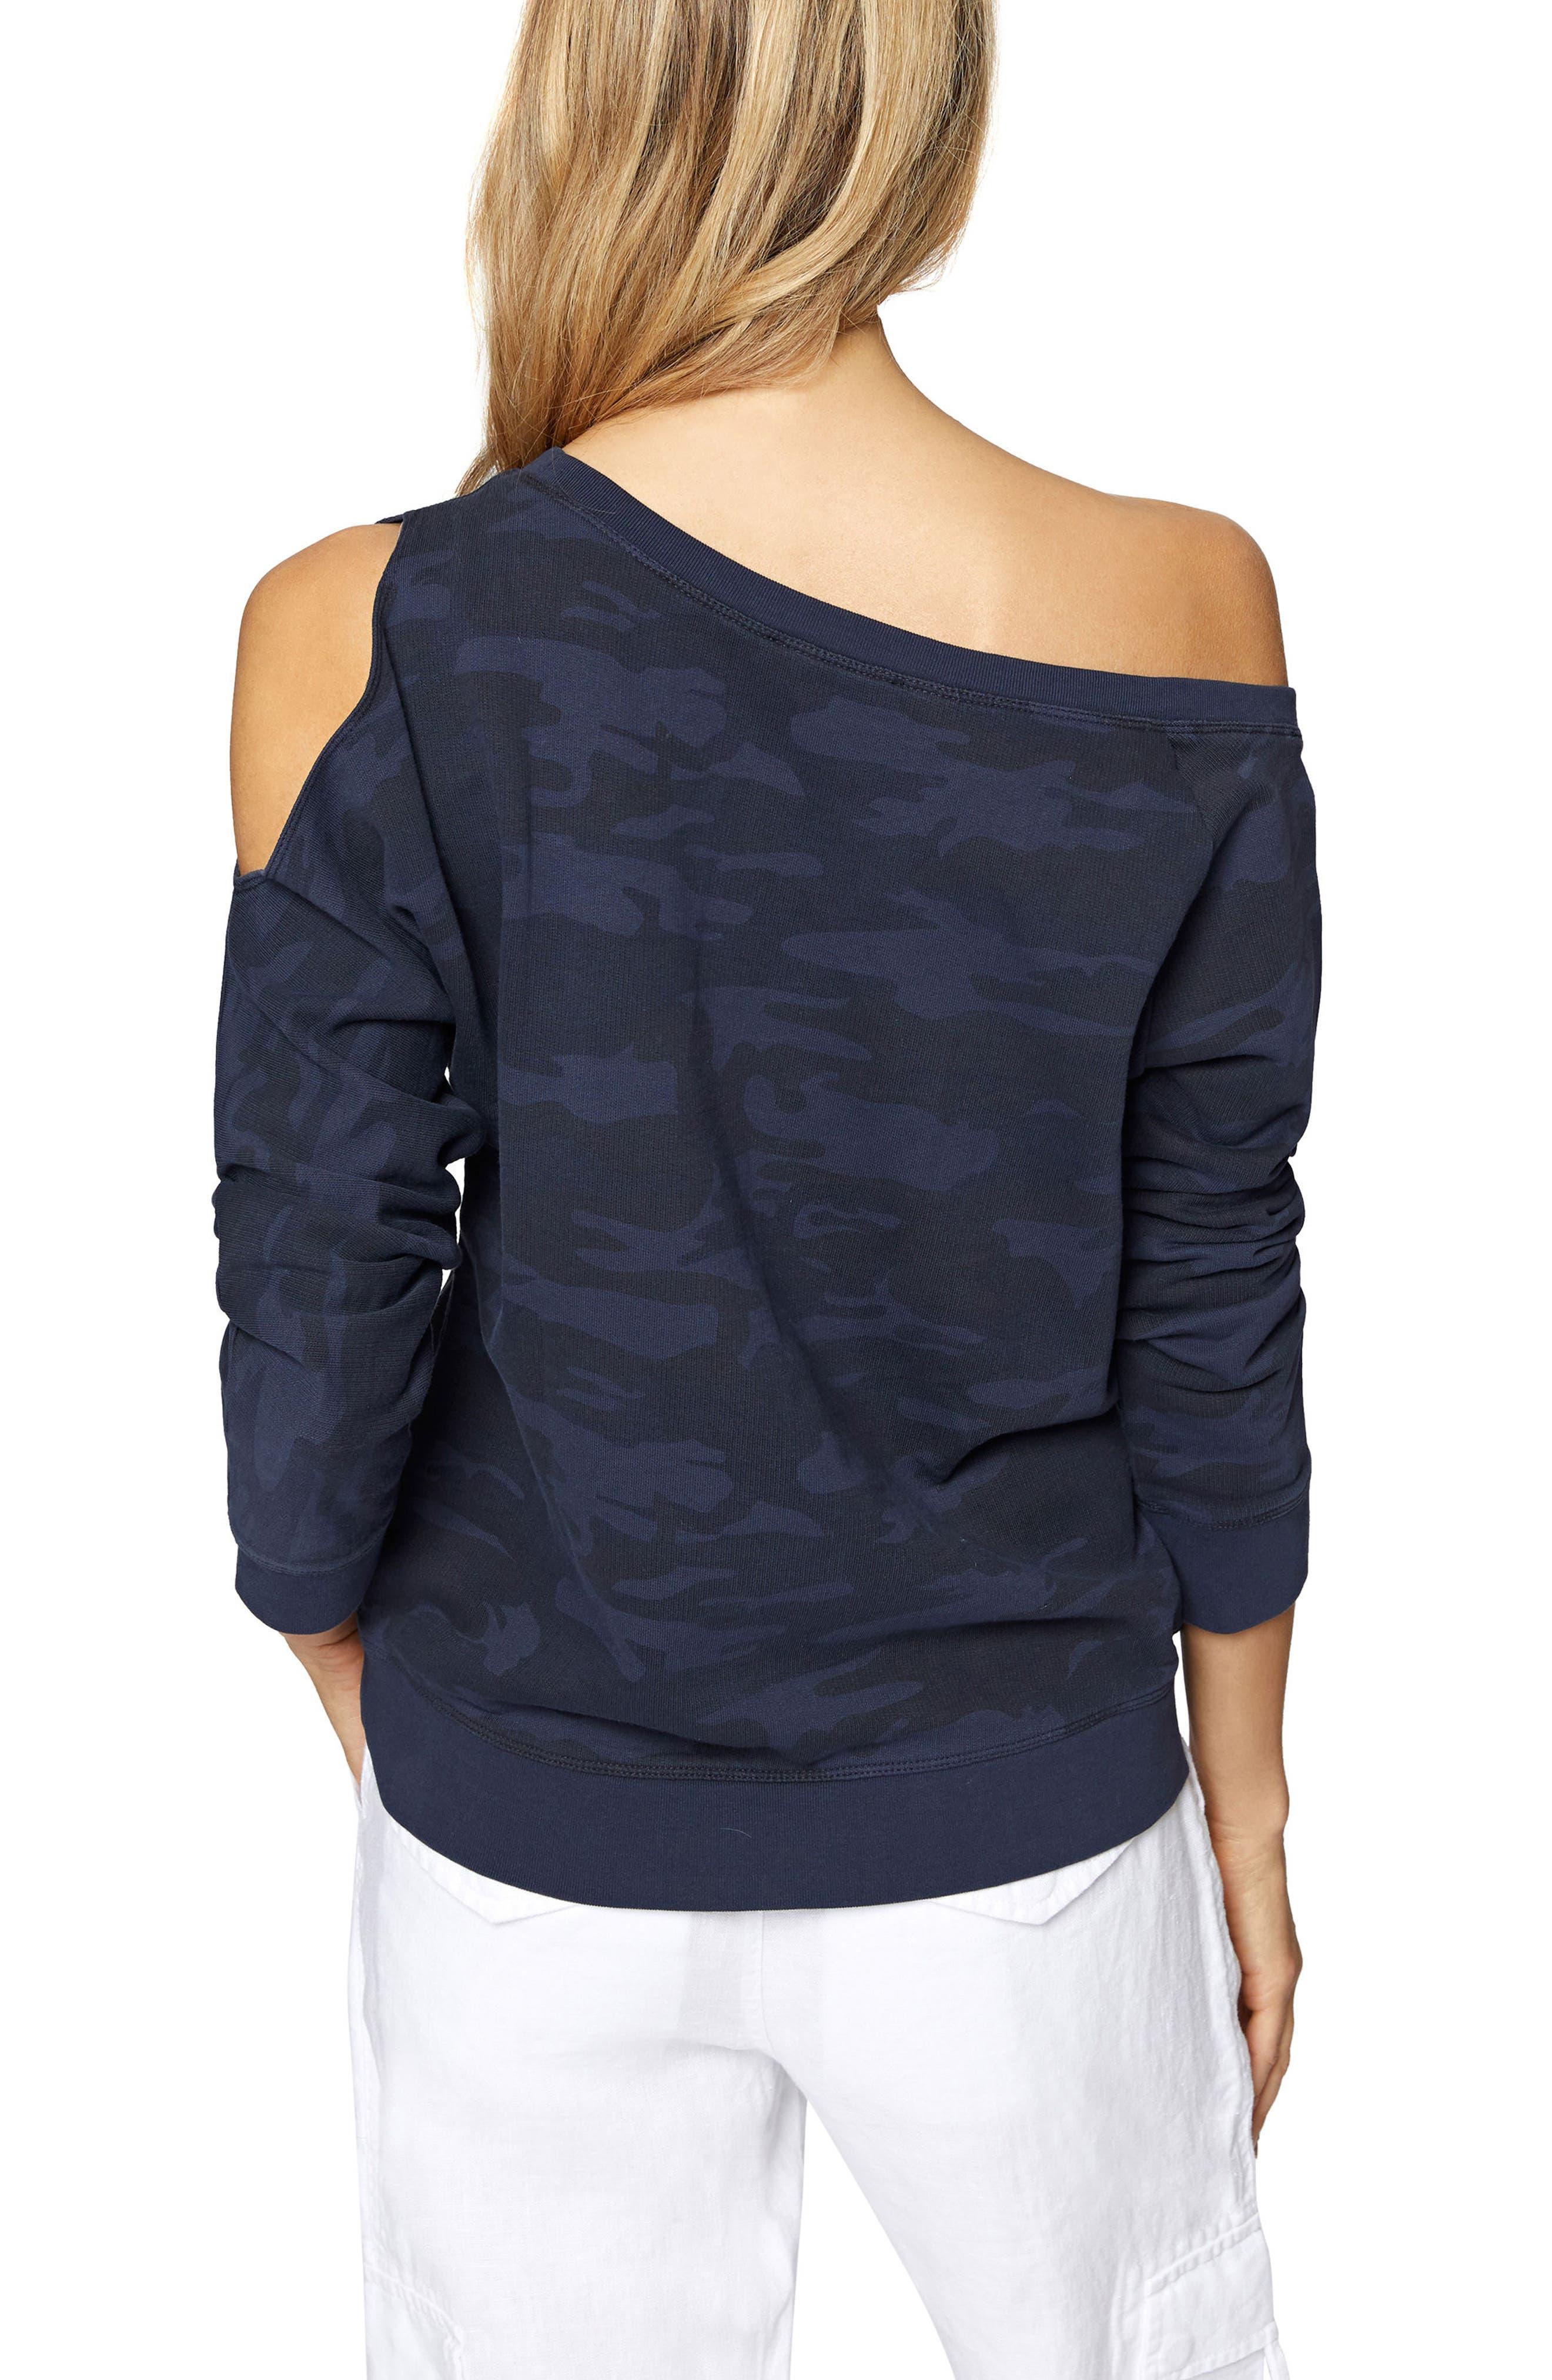 Alexi Asymmetrical Sweatshirt,                             Alternate thumbnail 2, color,                             Heritage Navy Camo